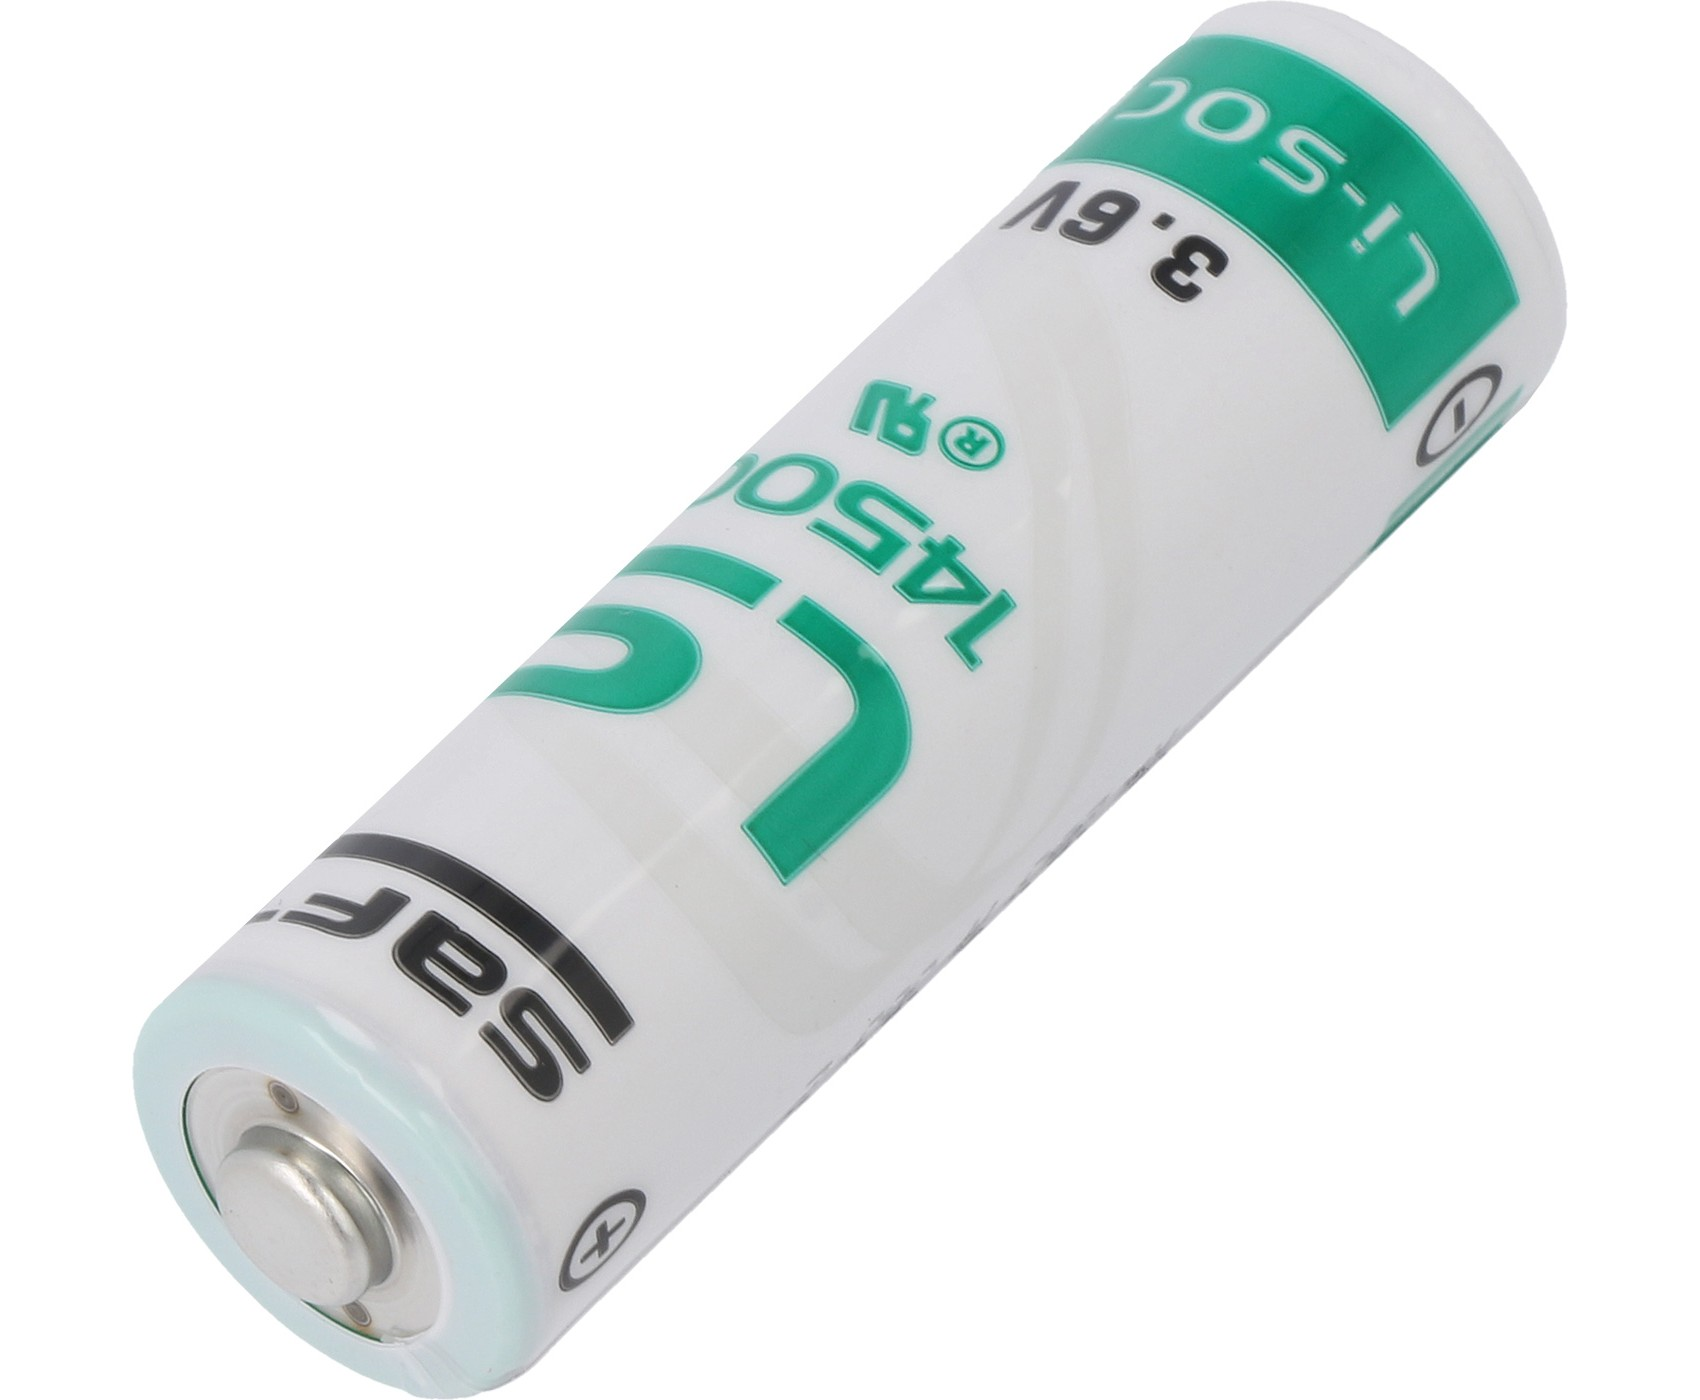 LS 14500 SAFT lithium cell